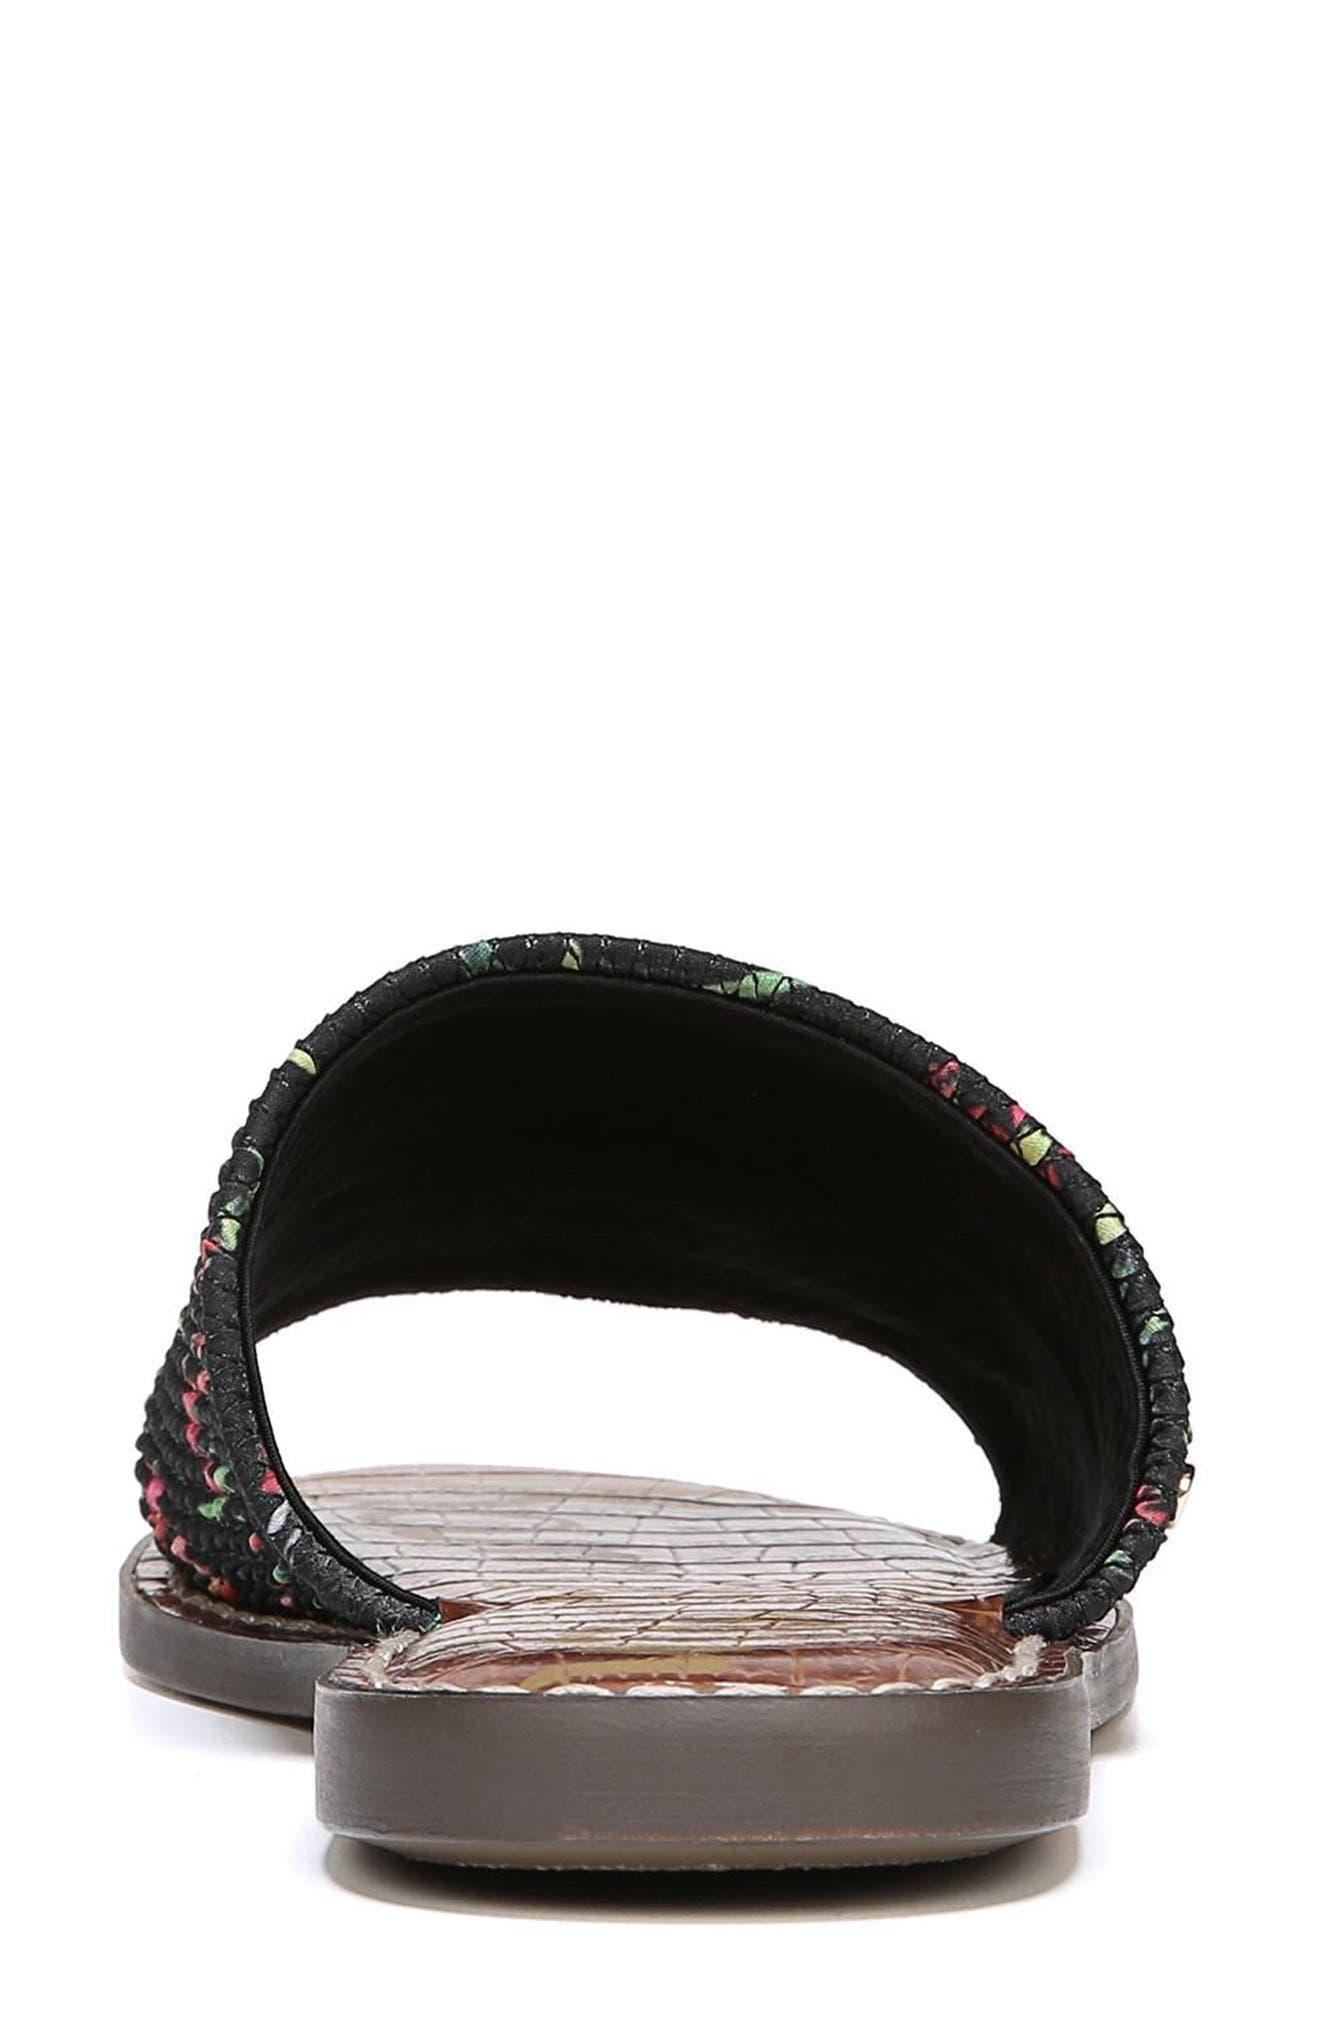 Gio Slide Sandal,                             Alternate thumbnail 8, color,                             BLACK FLORAL PRINT FABRIC